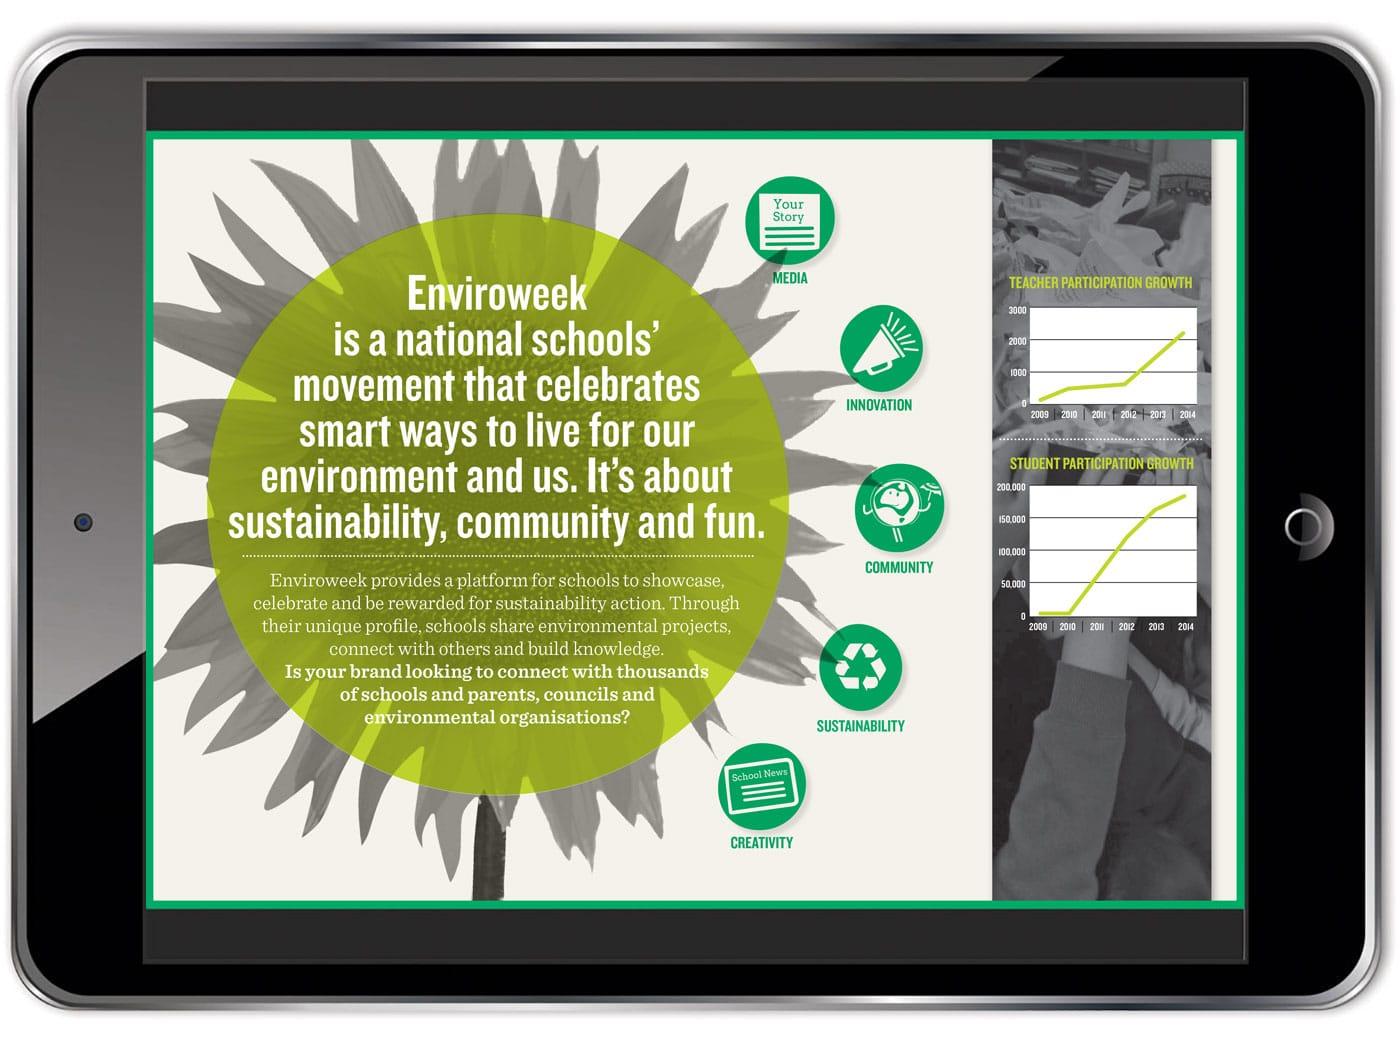 Enviroweek campaign design shown on ipad